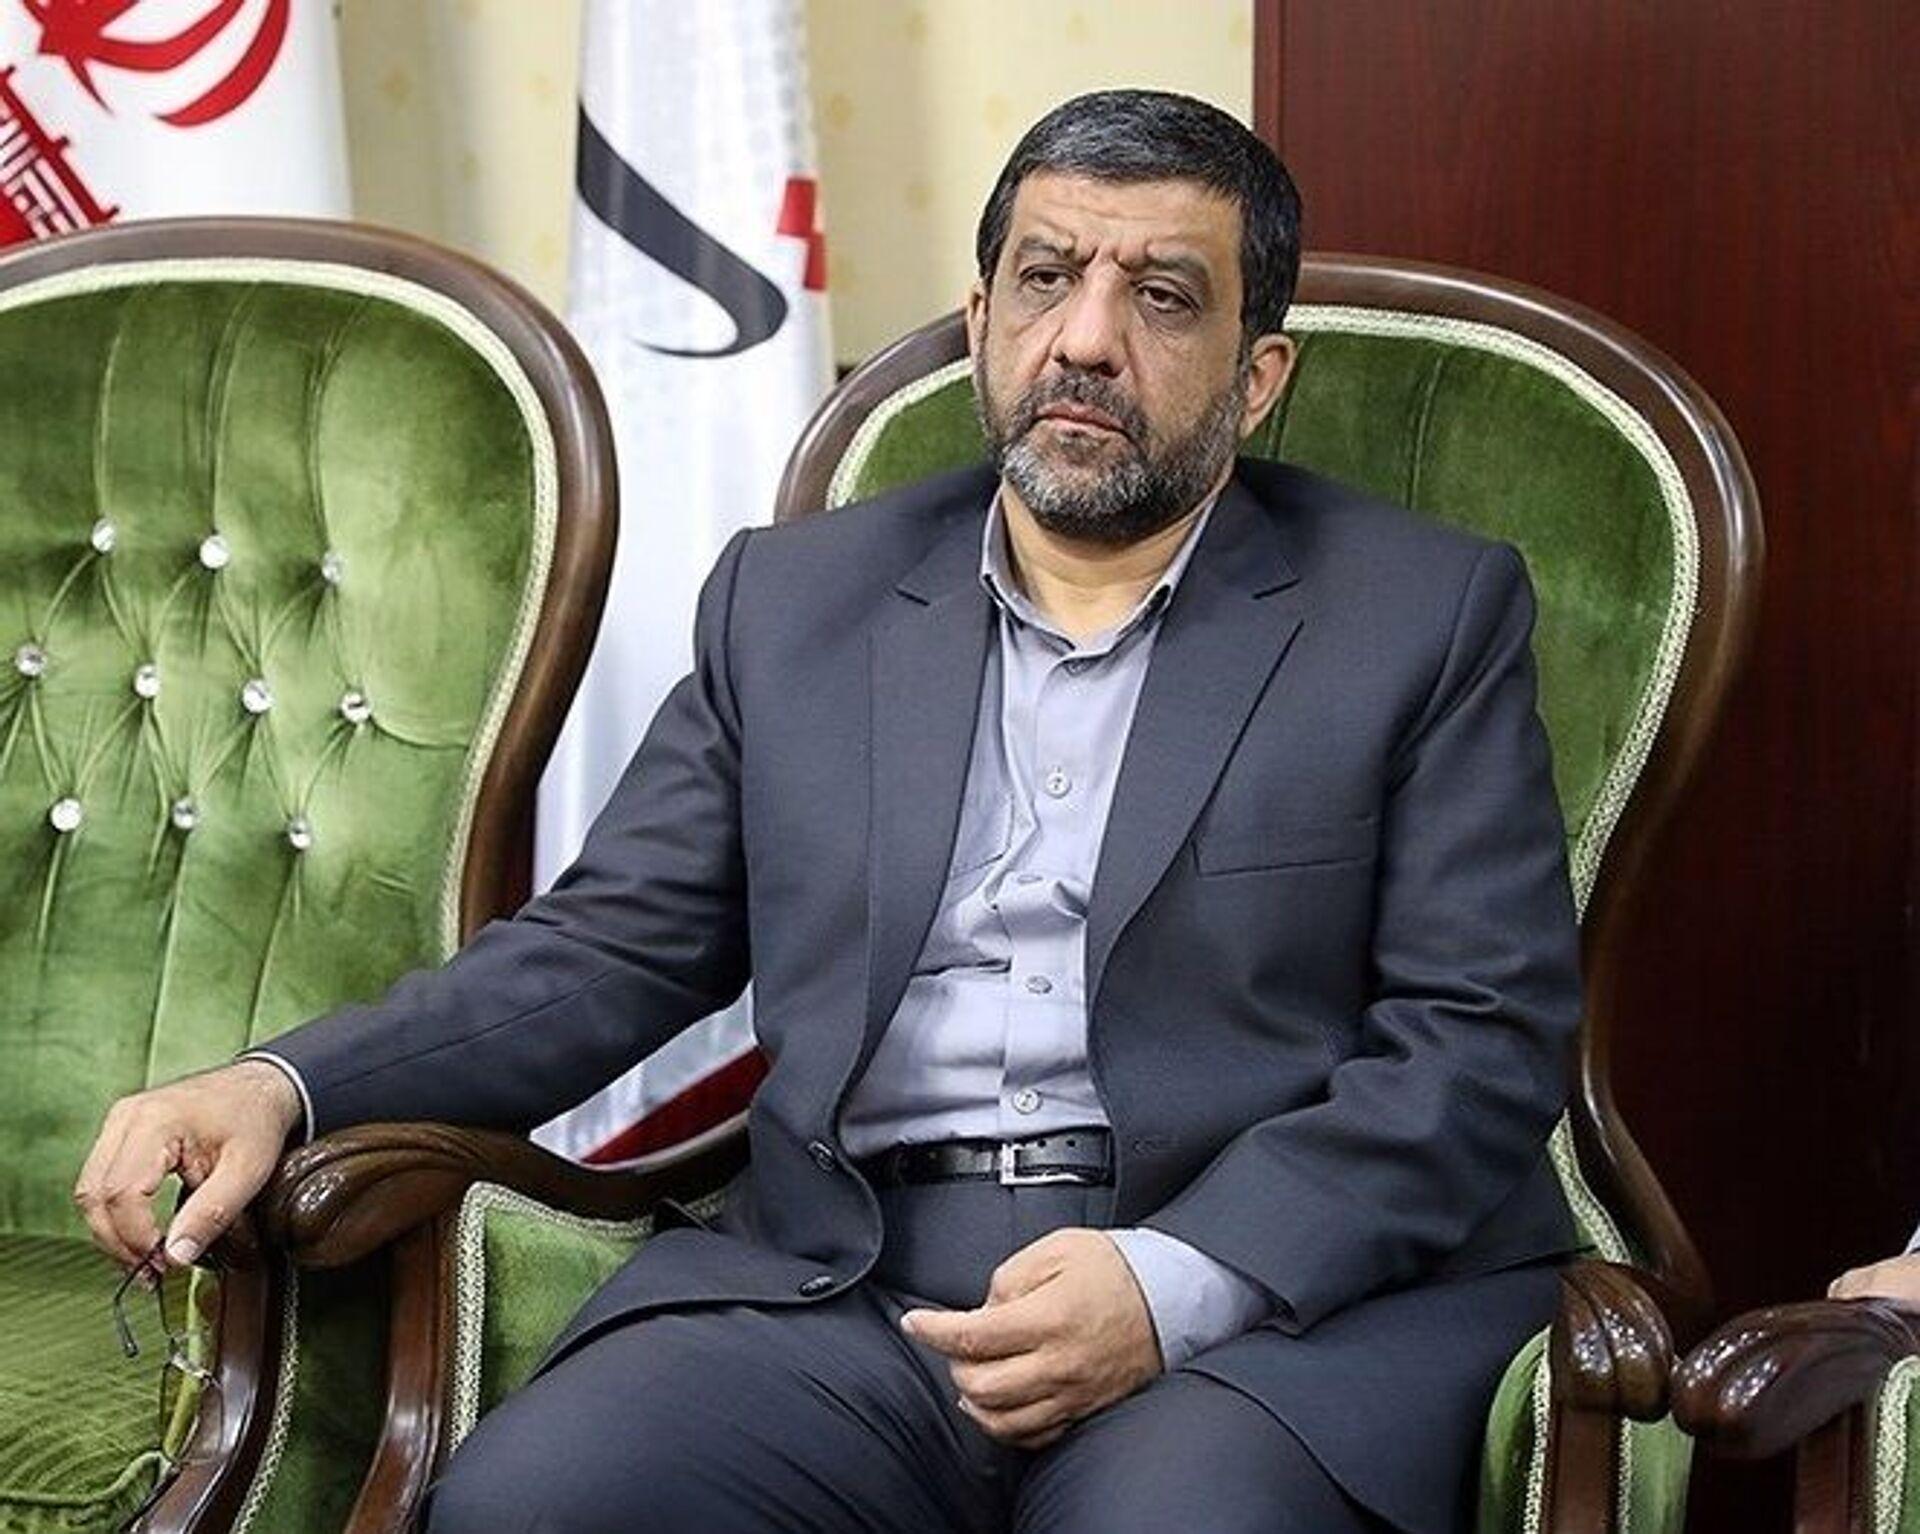 Ezzatollah Zarghami, Iranian Minister of Cultural Heritage, Tourism and Handicrafts - Sputnik International, 1920, 07.09.2021